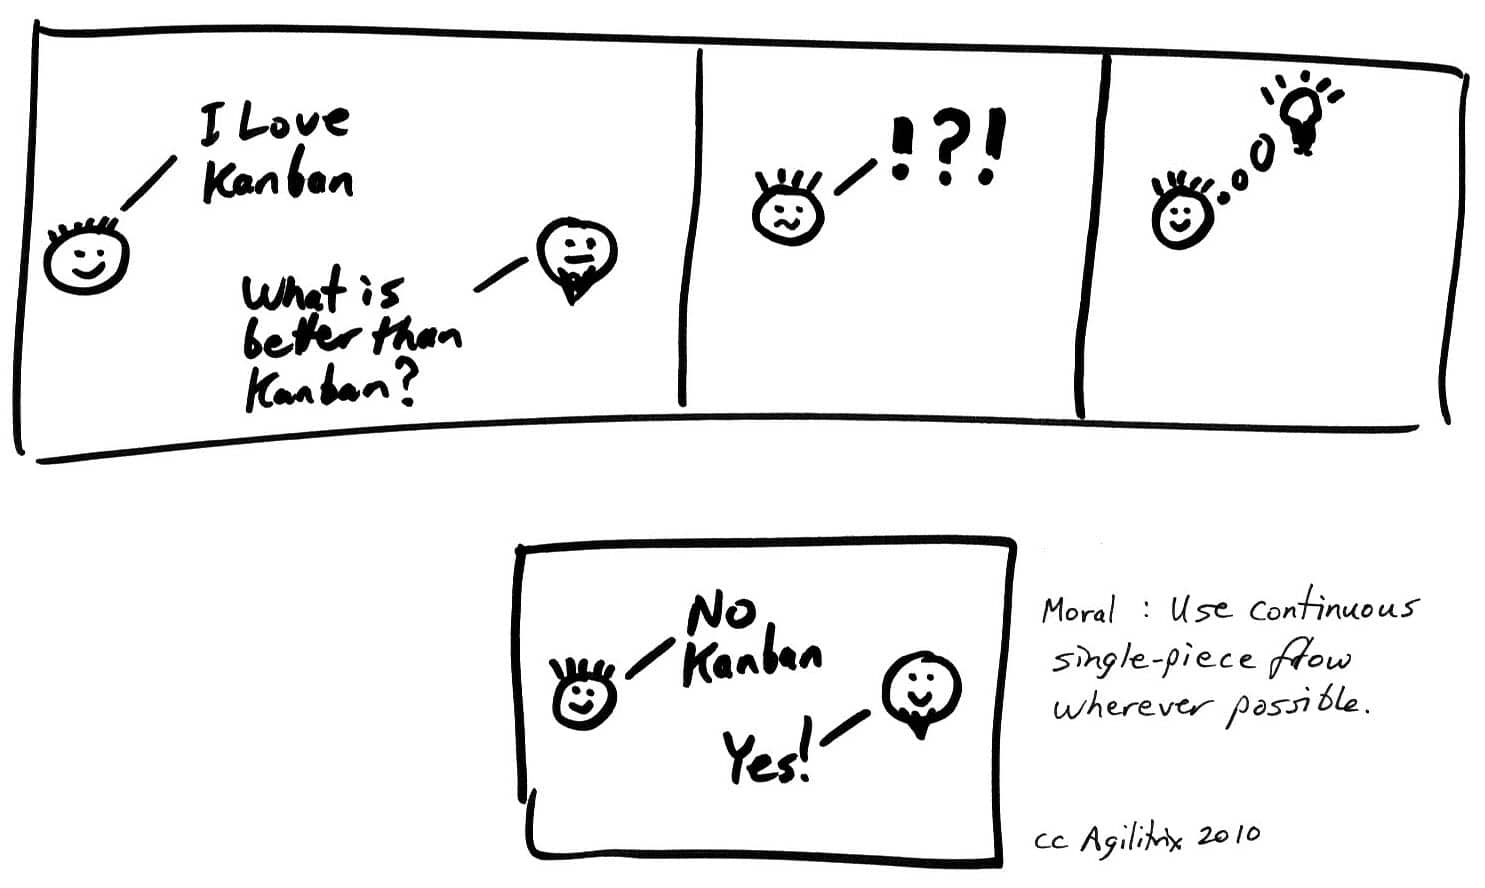 Vide Freeman Consultant Corporation Kanban